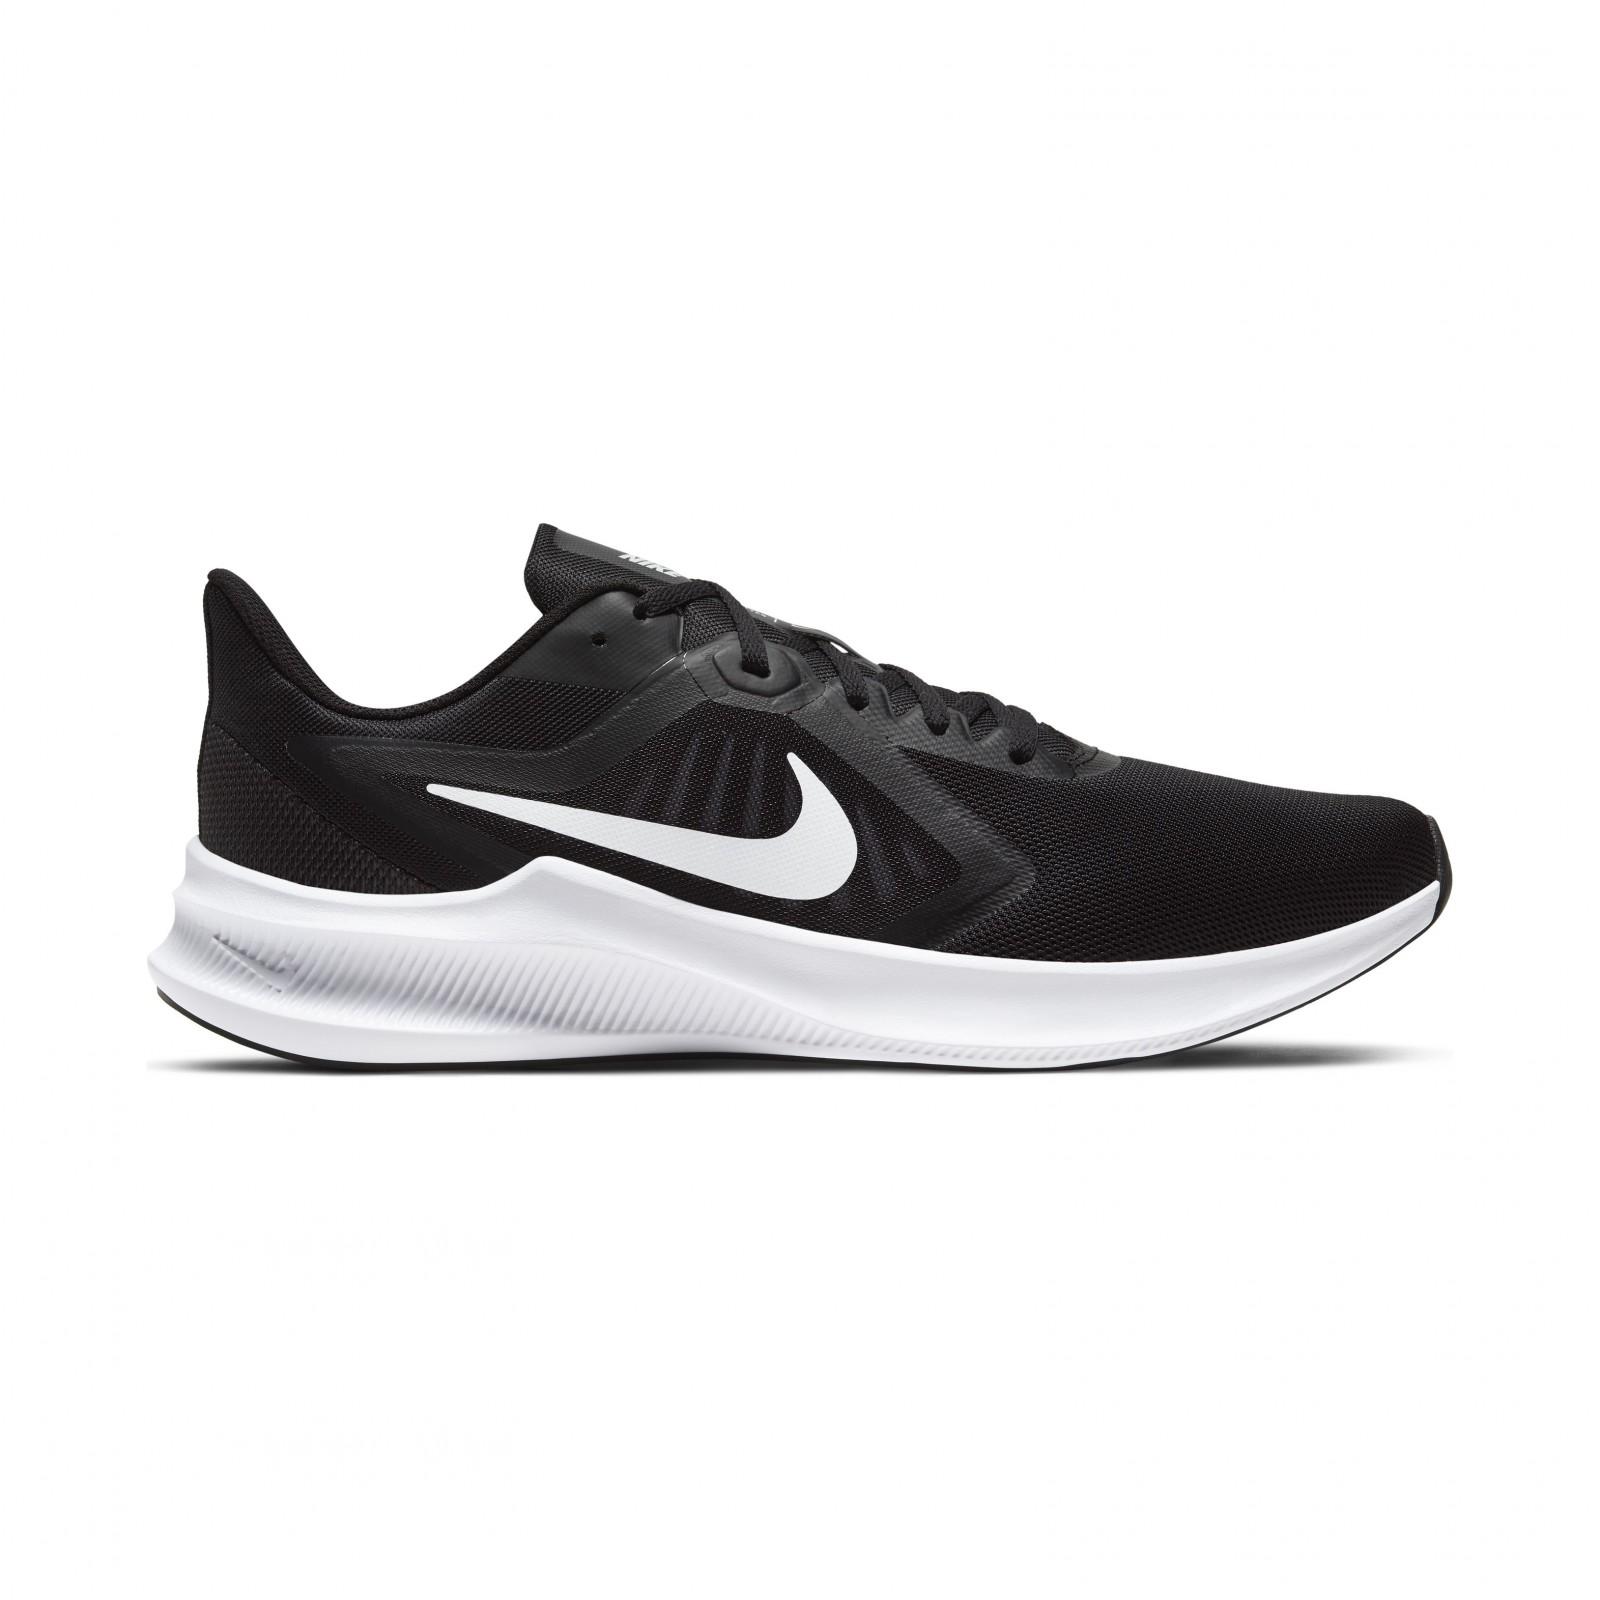 Nike Downshifter 10 BLACK/WHITE-ANTHRACITE